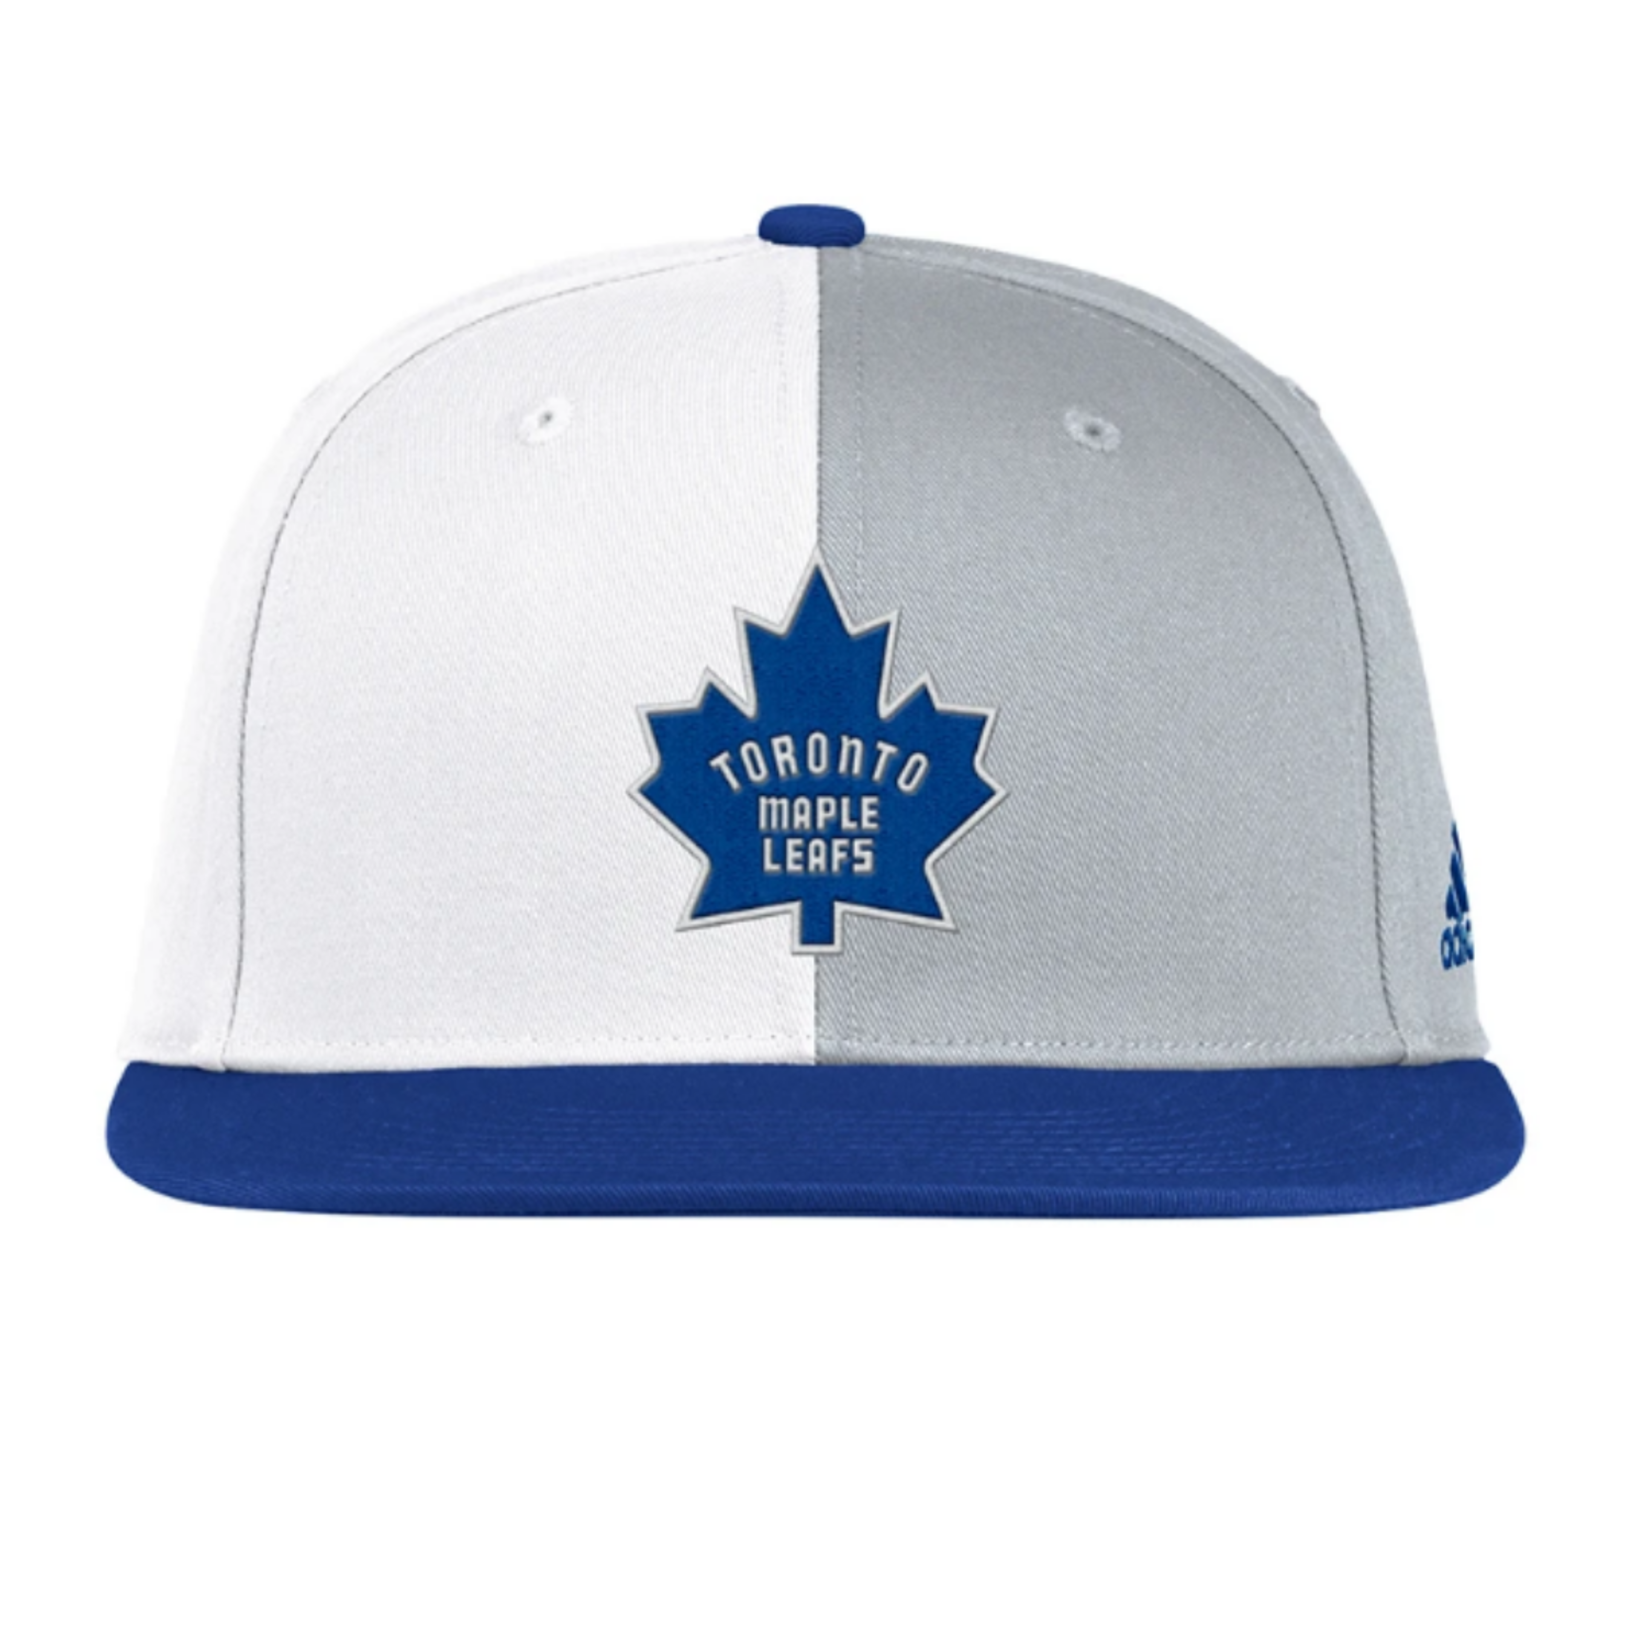 Maple Leafs Retro Reverse Flat Brim Snapback Hat